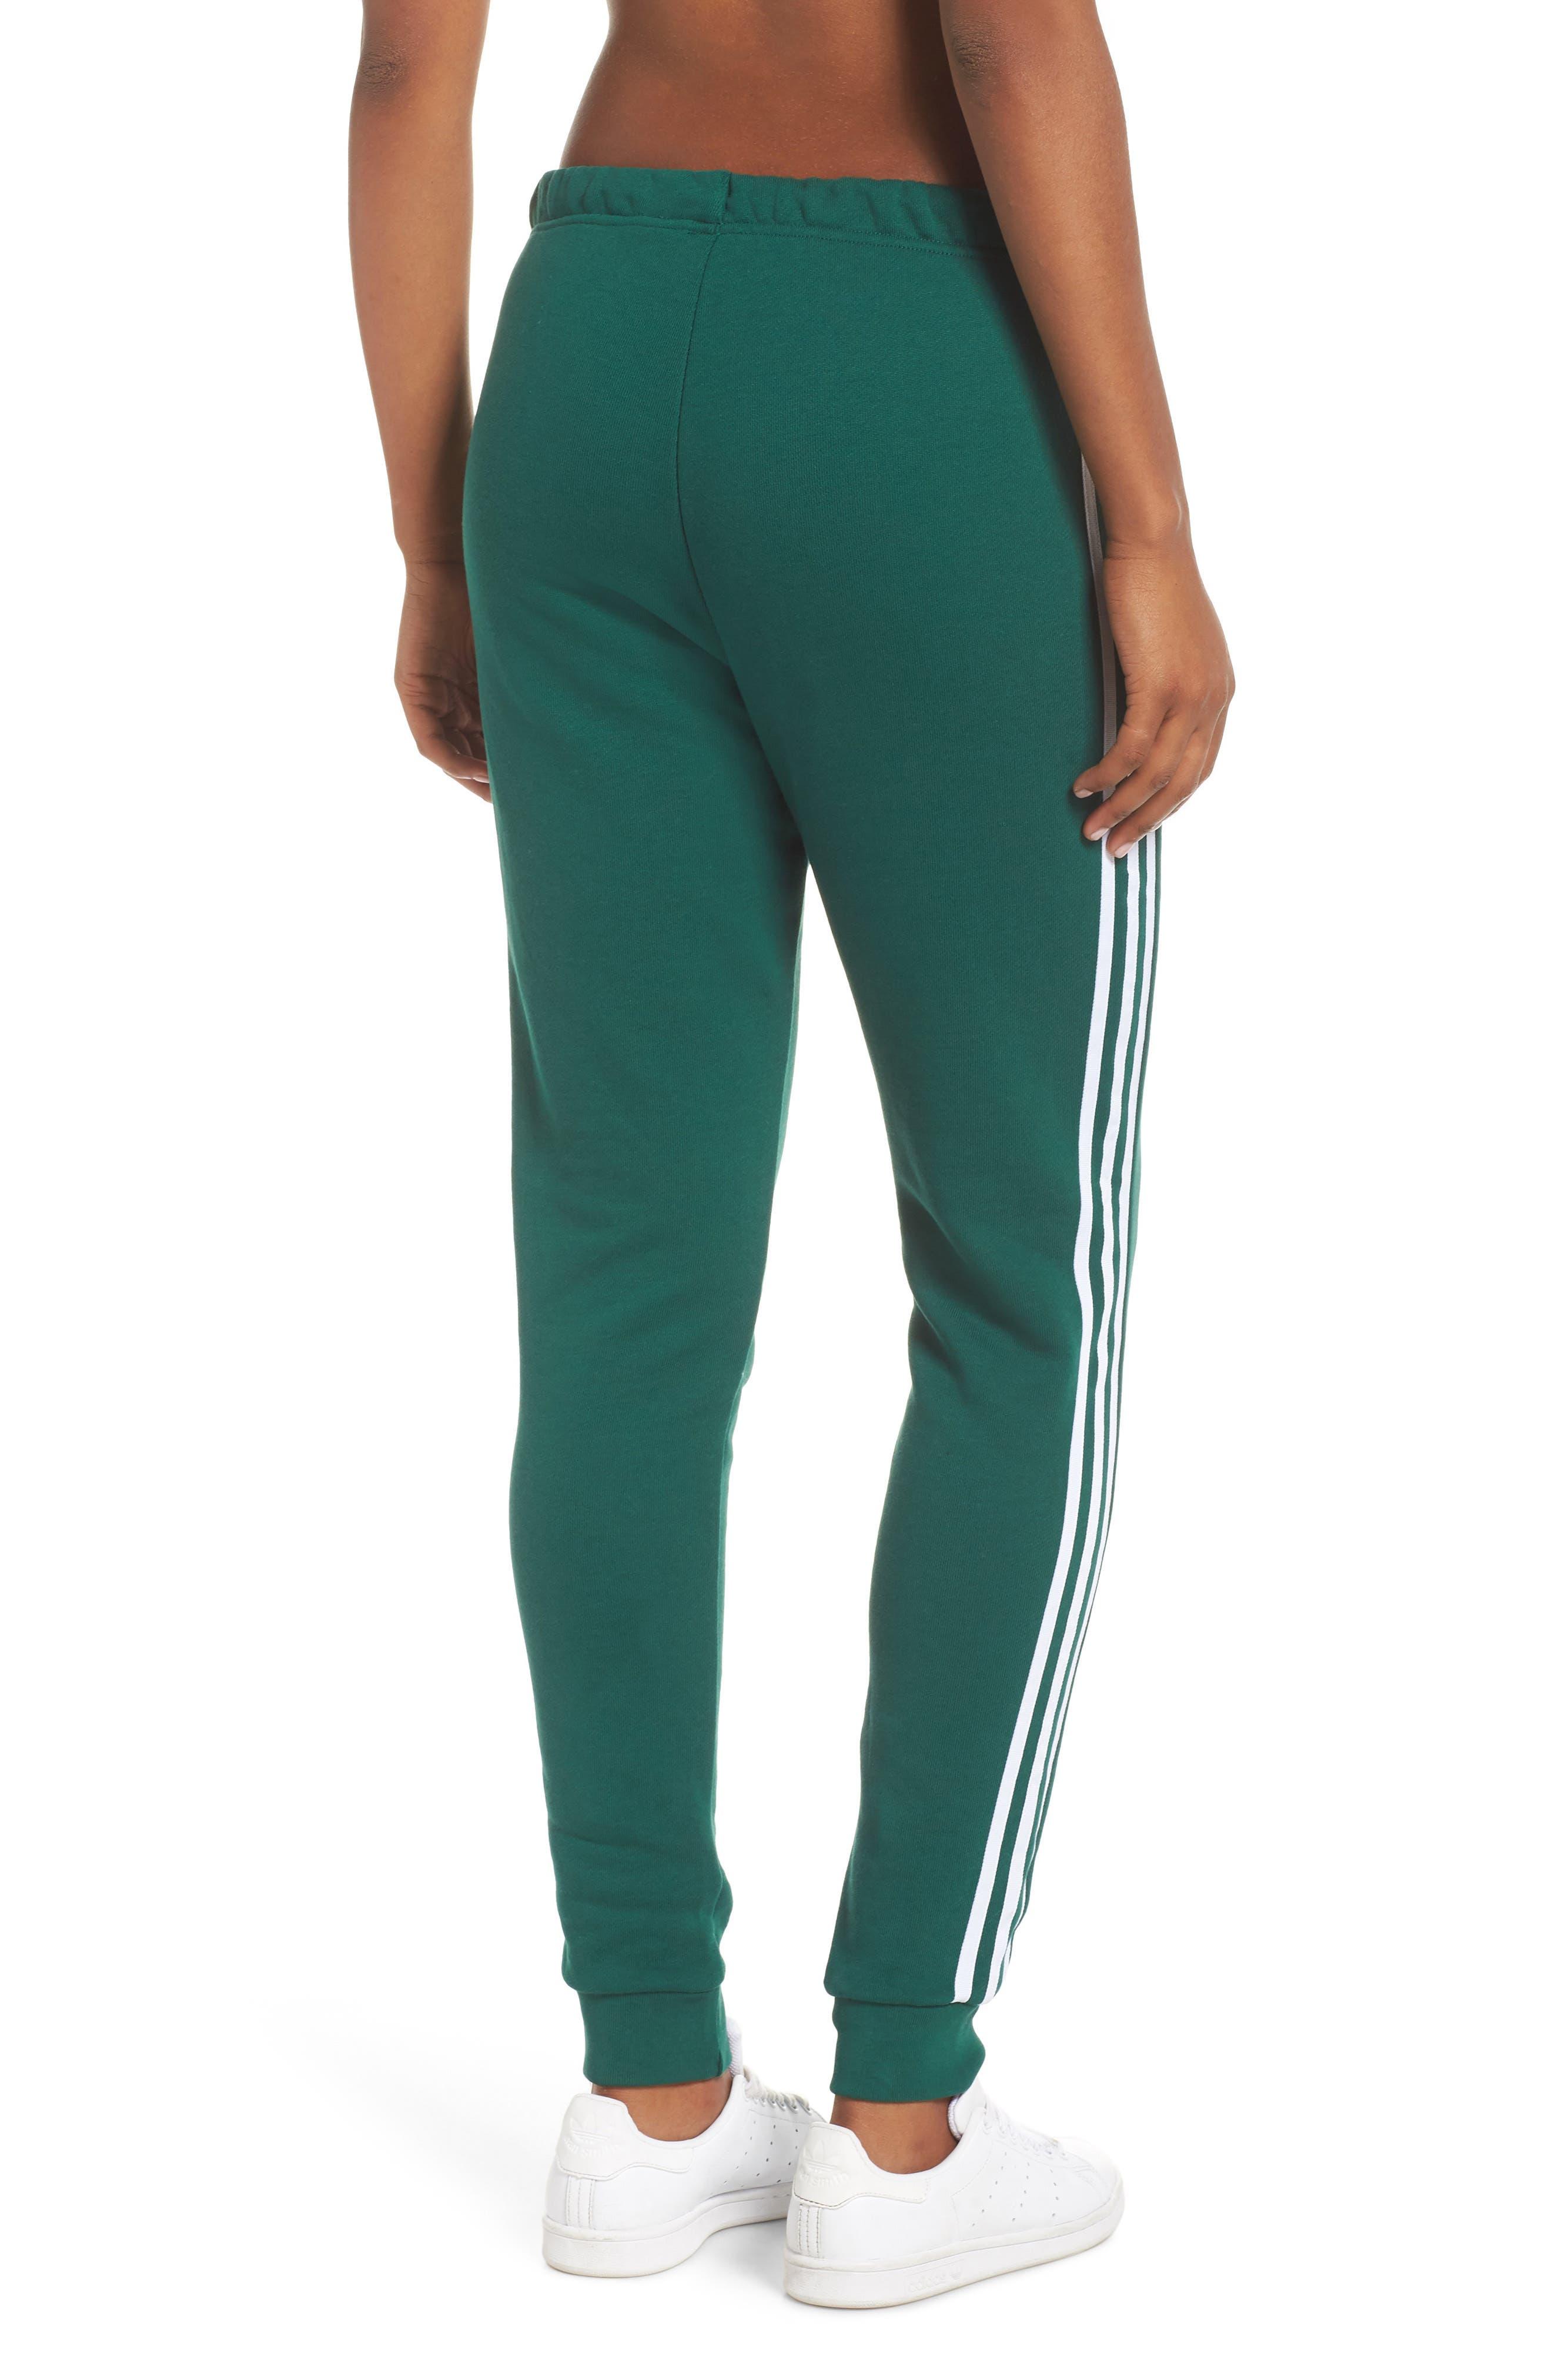 ADIDAS ORIGINALS, Cuffed Track Pants, Alternate thumbnail 2, color, 305